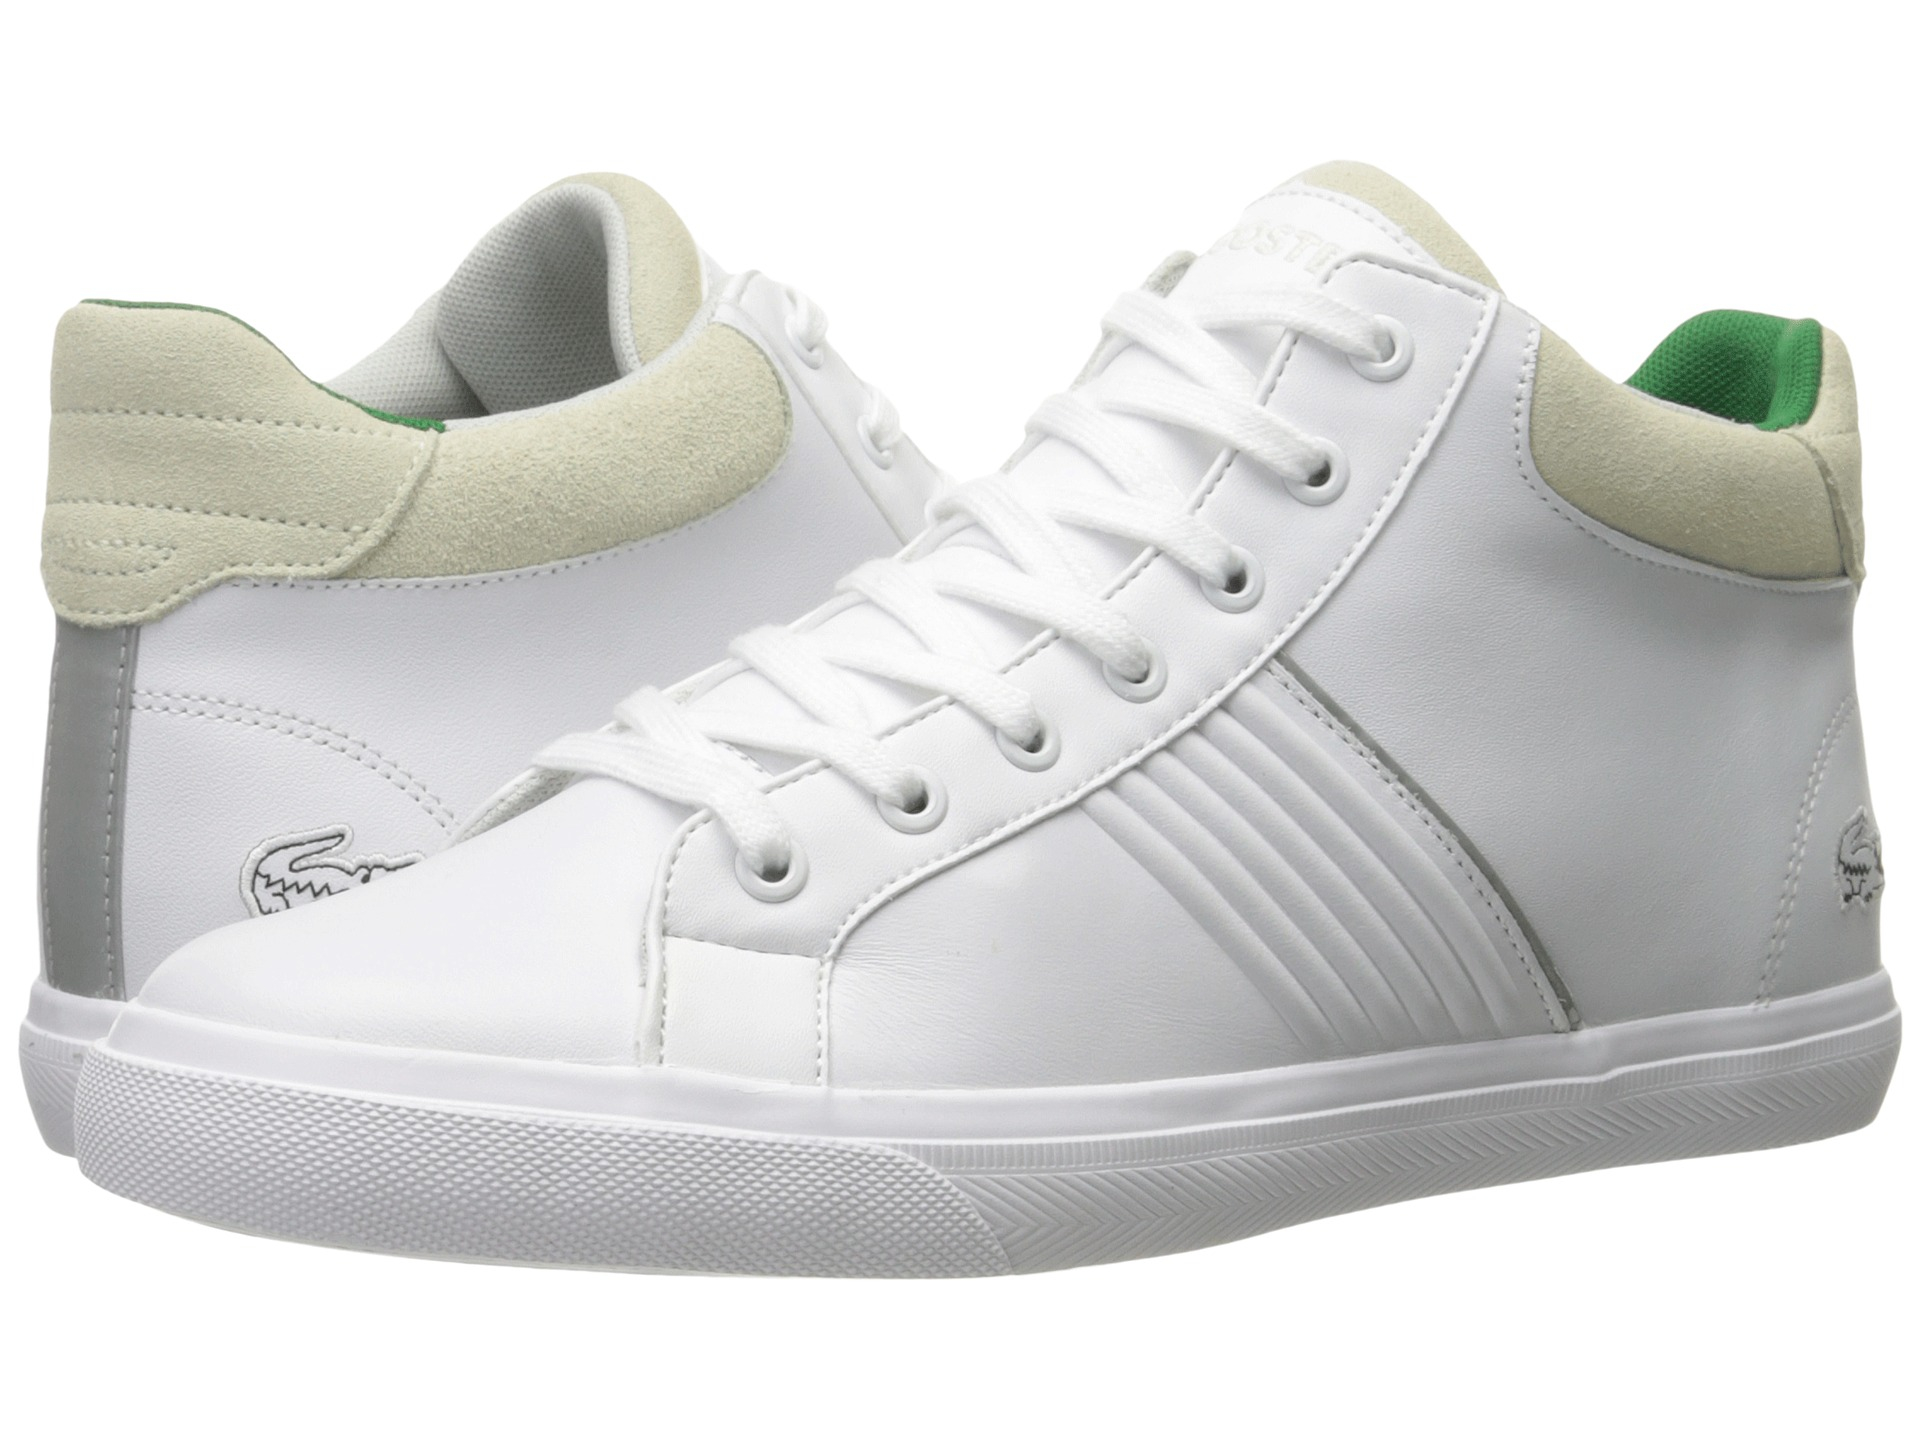 66d5c75eb Lyst - Lacoste Fairlead Mid 316 1 in White for Men